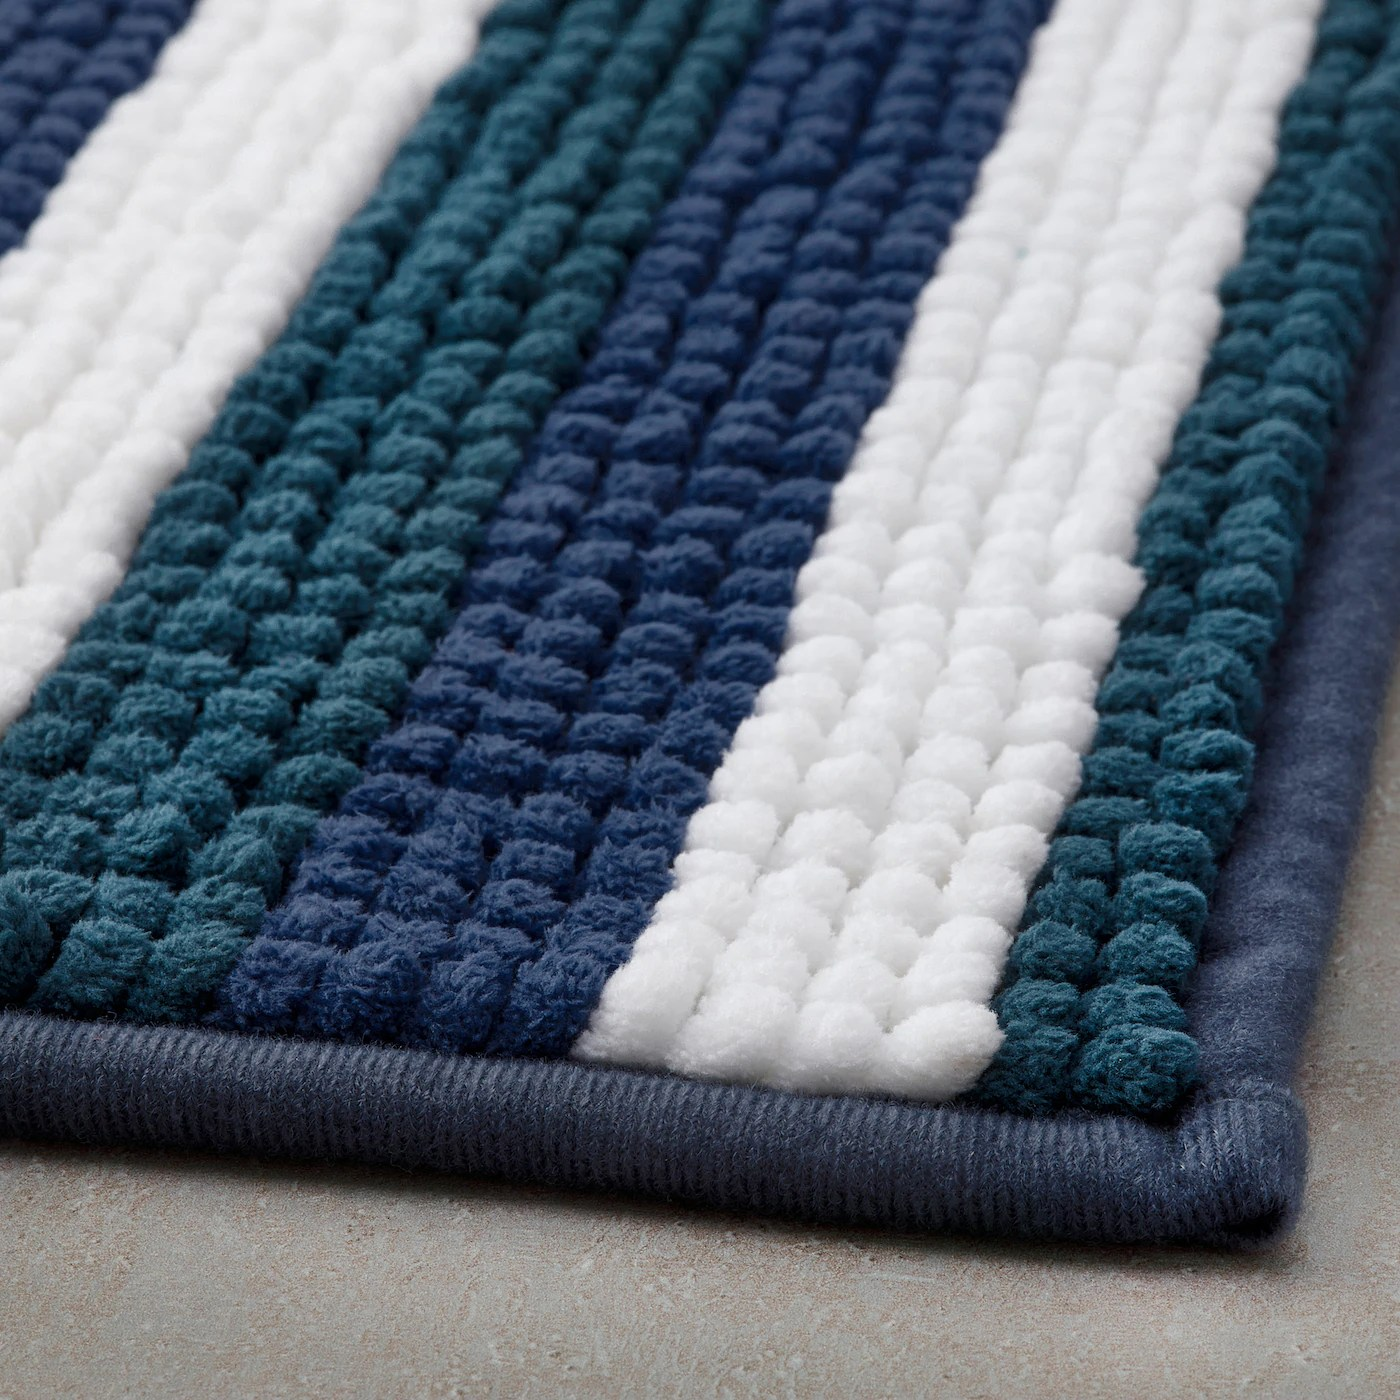 toftbo tapis de bain multicolore 50x80 cm